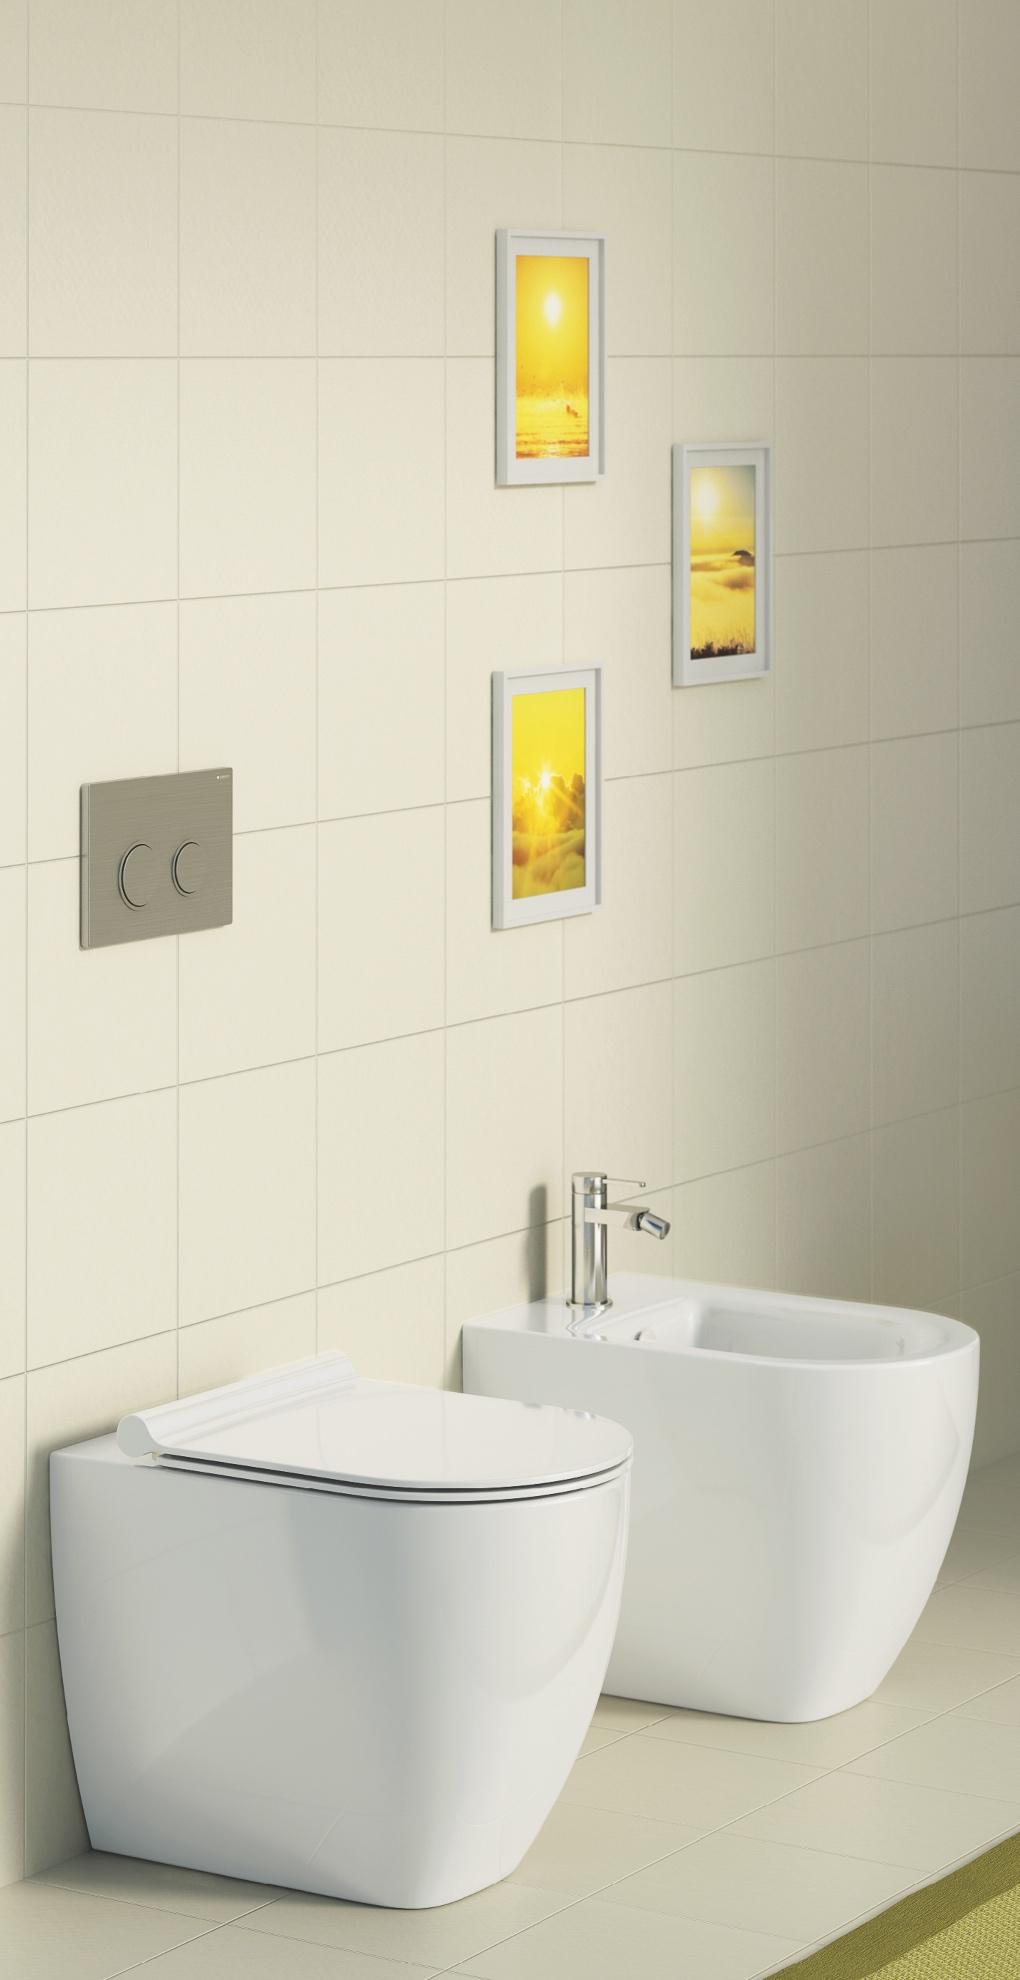 Catalano Sfera_wc toilet_NF_bidet_54 newflush btw gulvskål